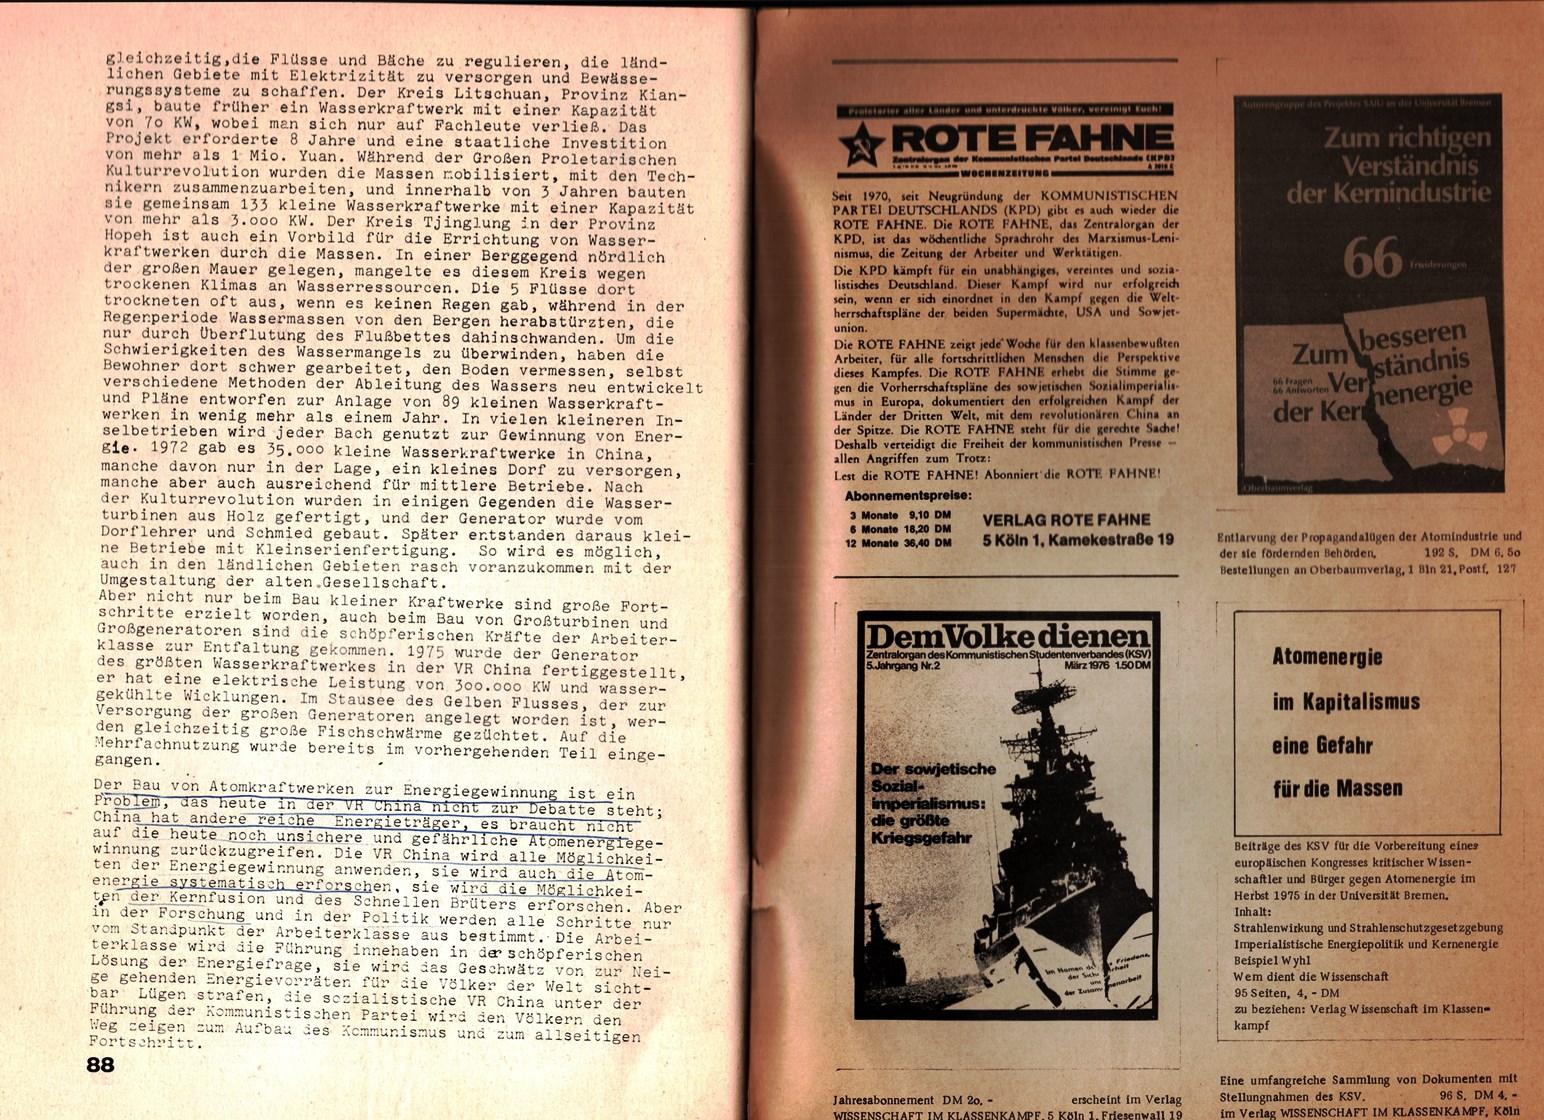 KSV_1976_Atomenergie_im_Kapitalismus_046